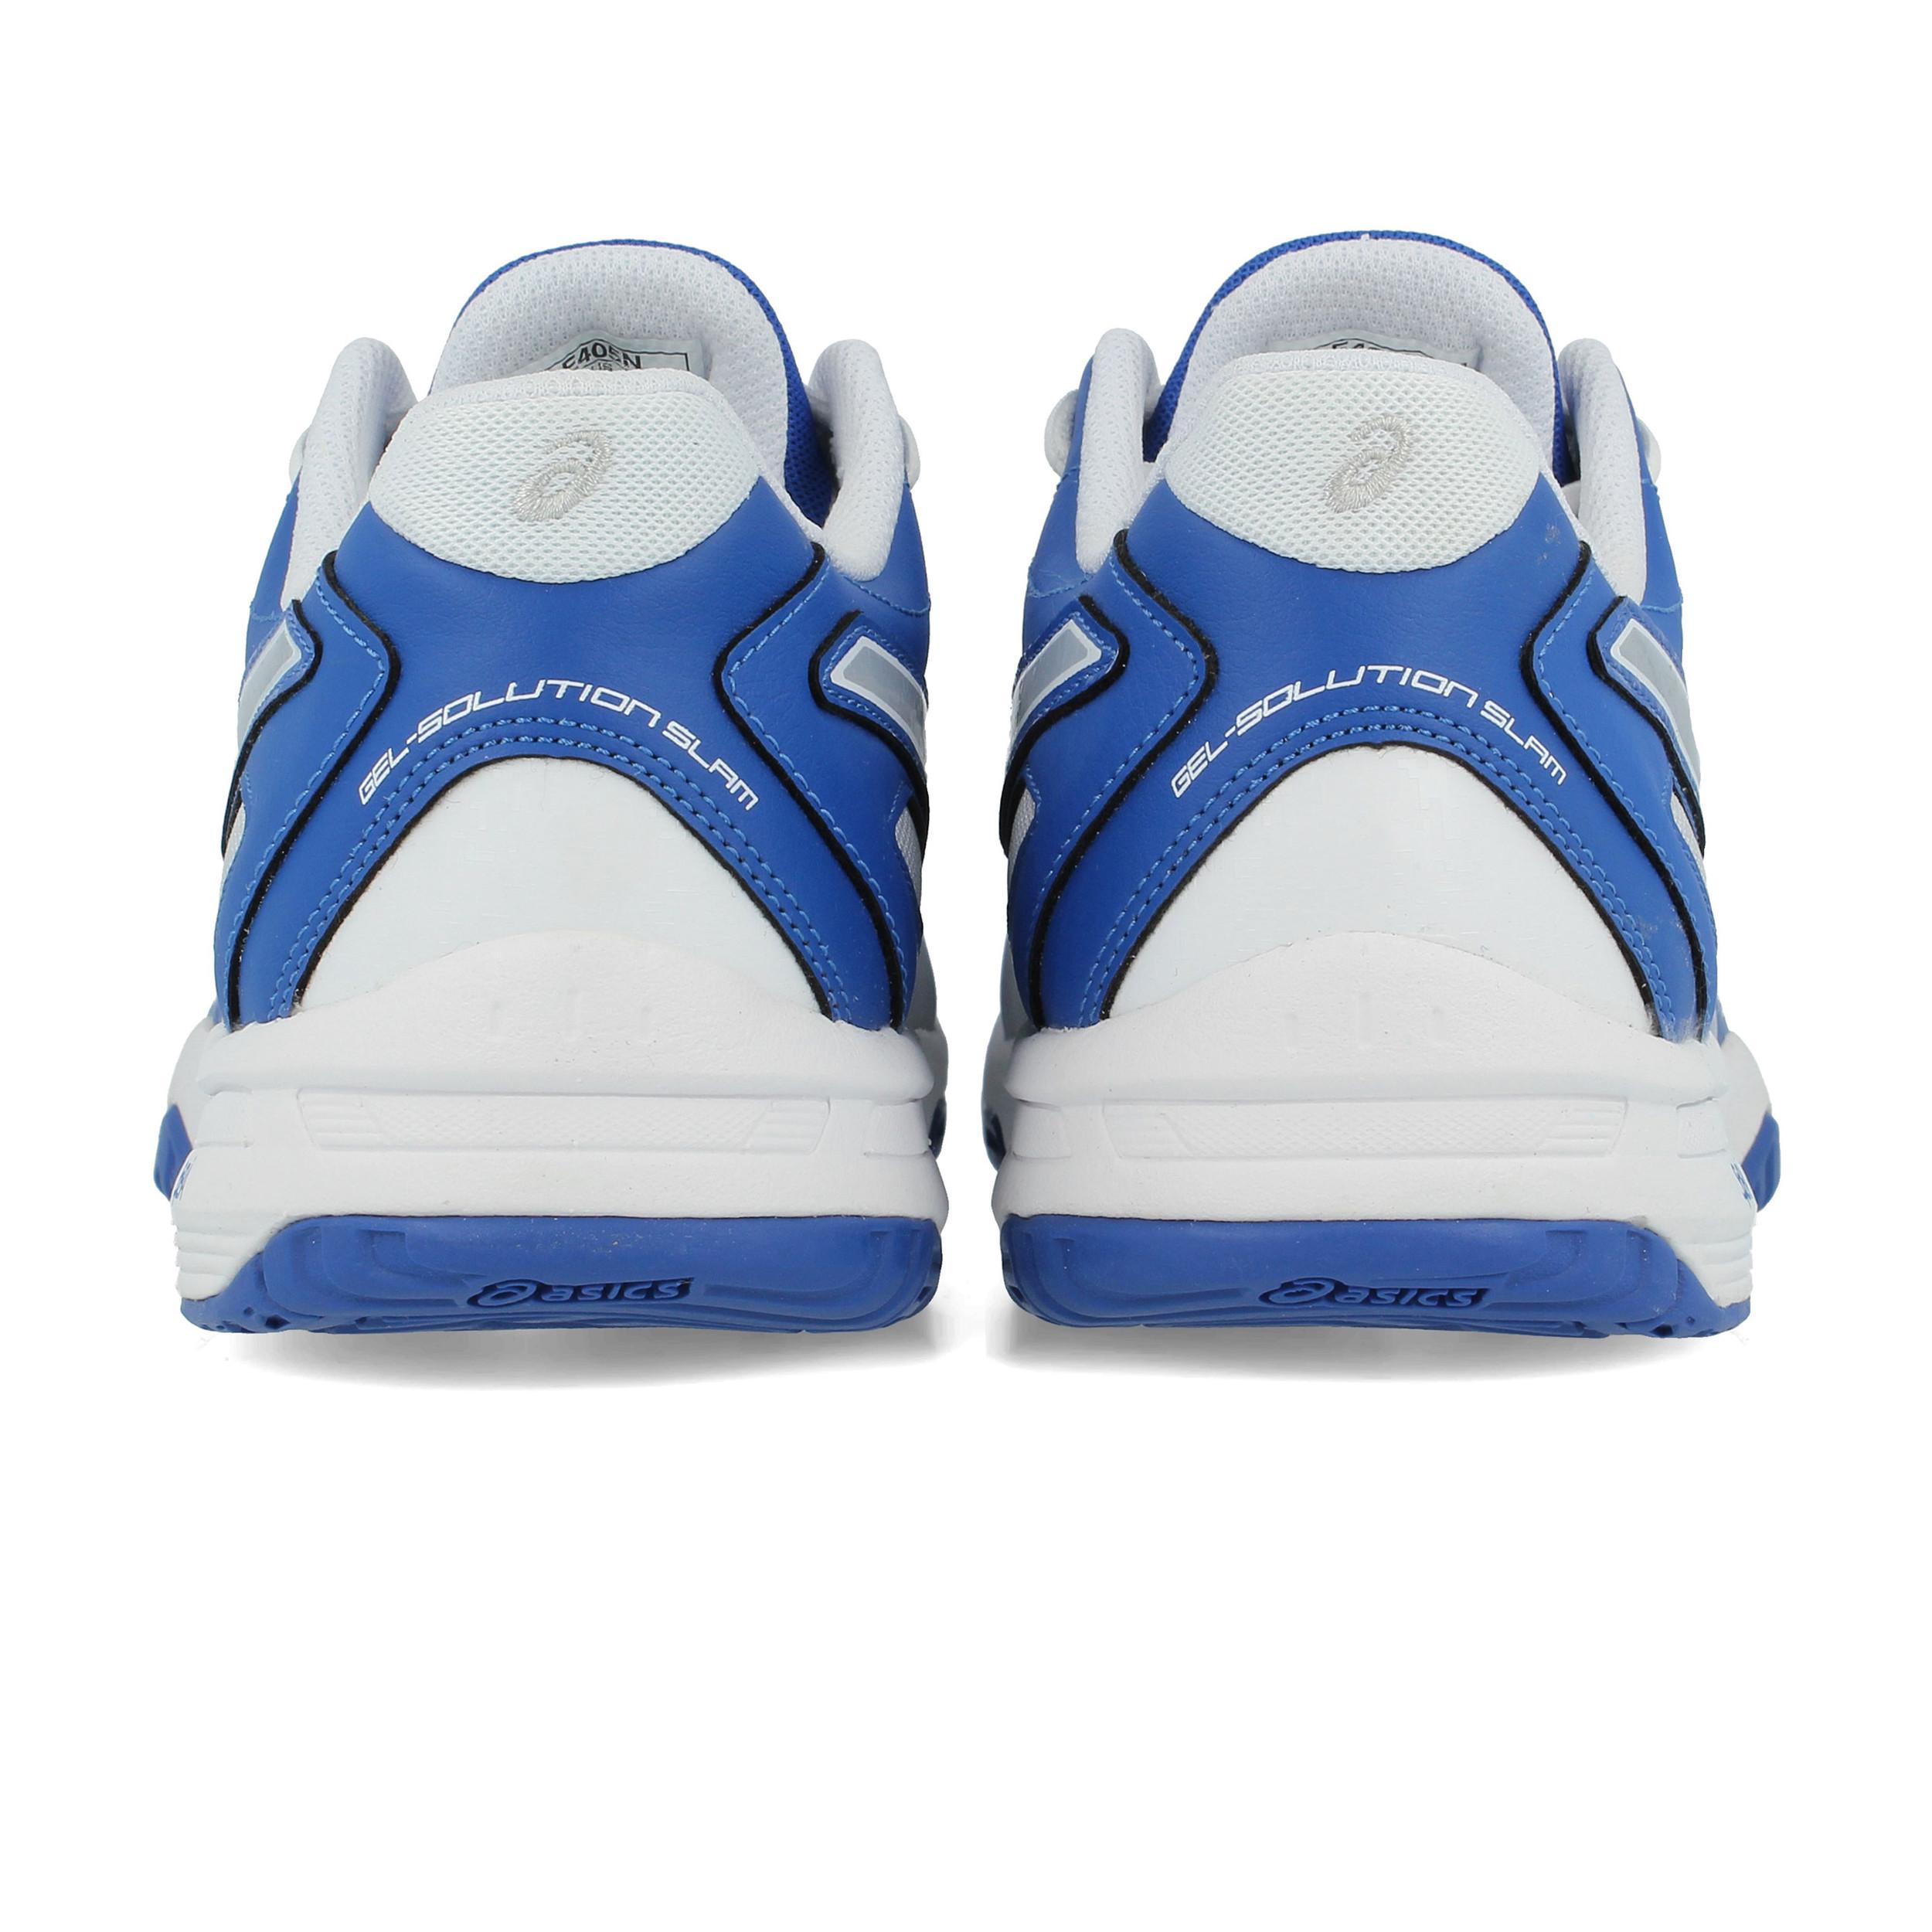 Asics Mens Gel-Solution Slam 2 Tennis Shoes Blue White Breathable Trainers d3bc90383d2